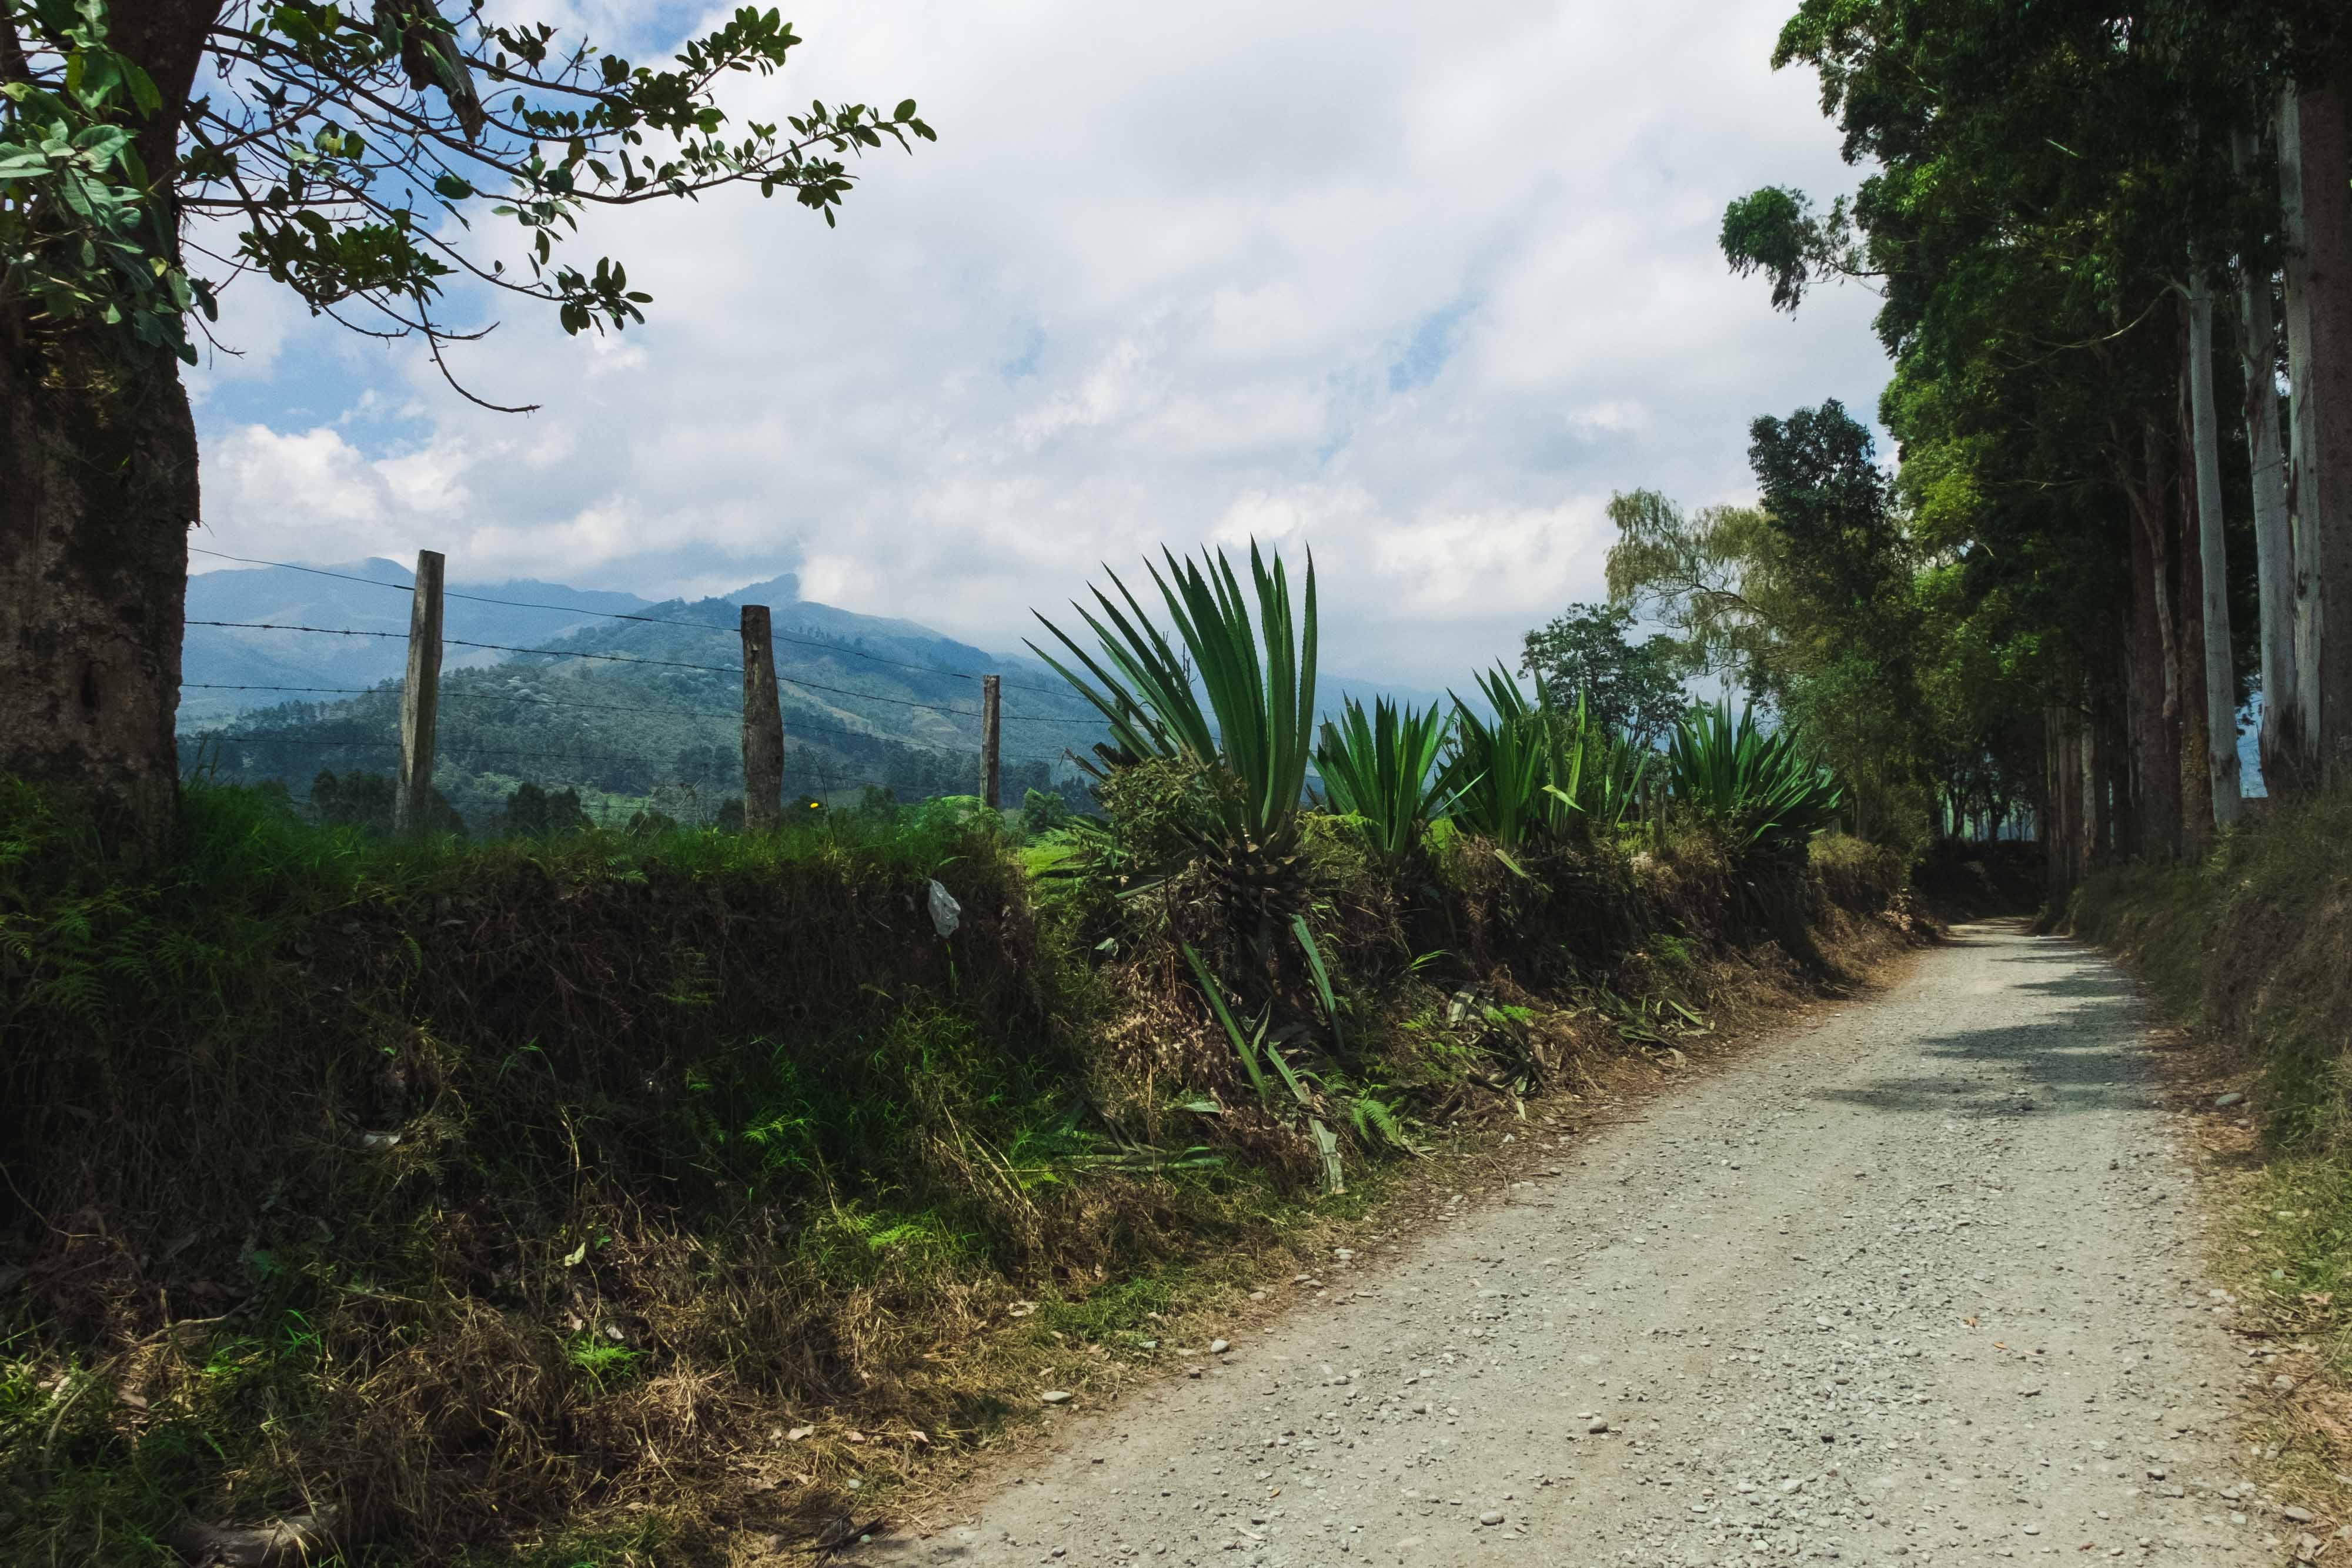 Carretera a Salento